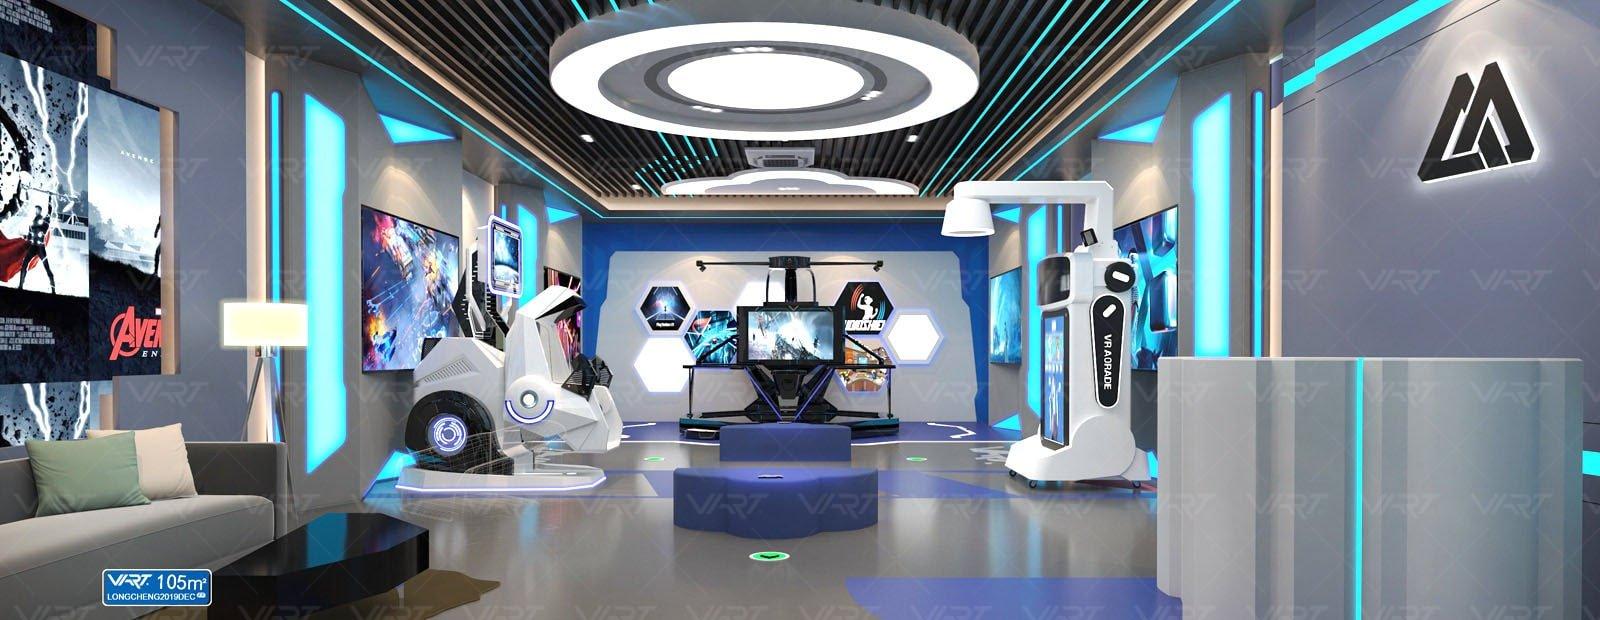 VR Theme Park Norway